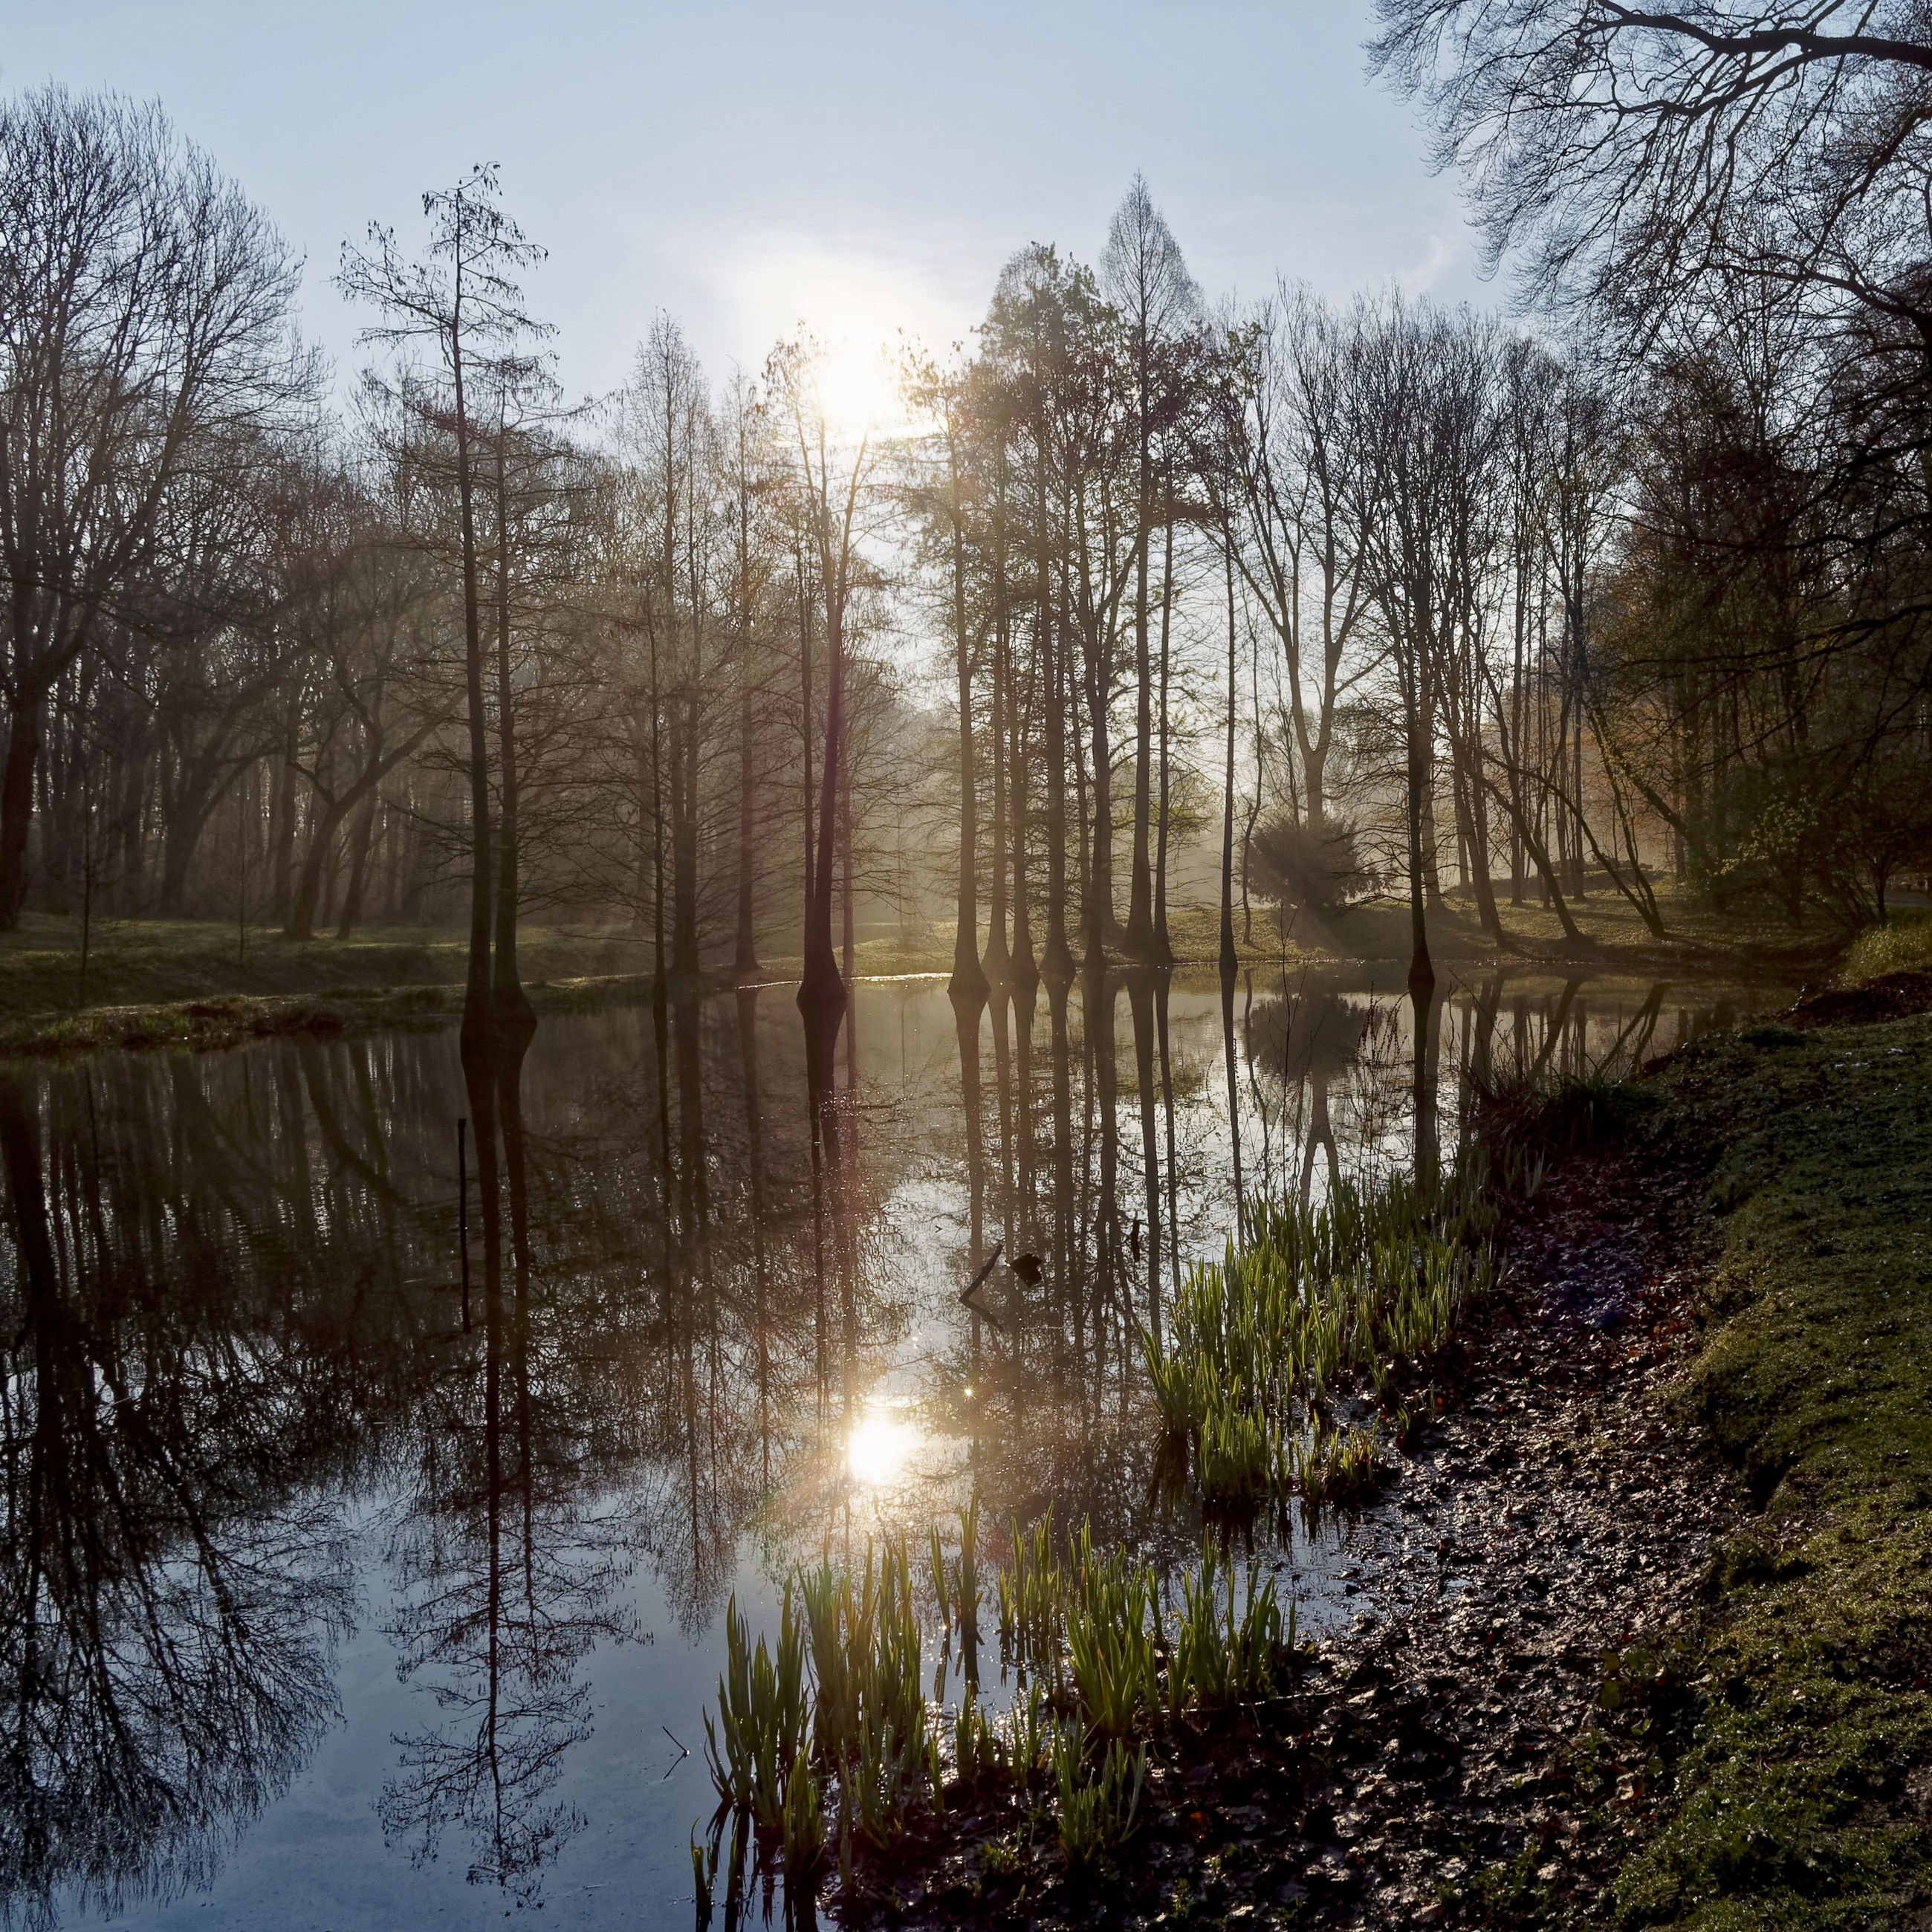 SUN SHINING THROUGH TREES IN LAKE